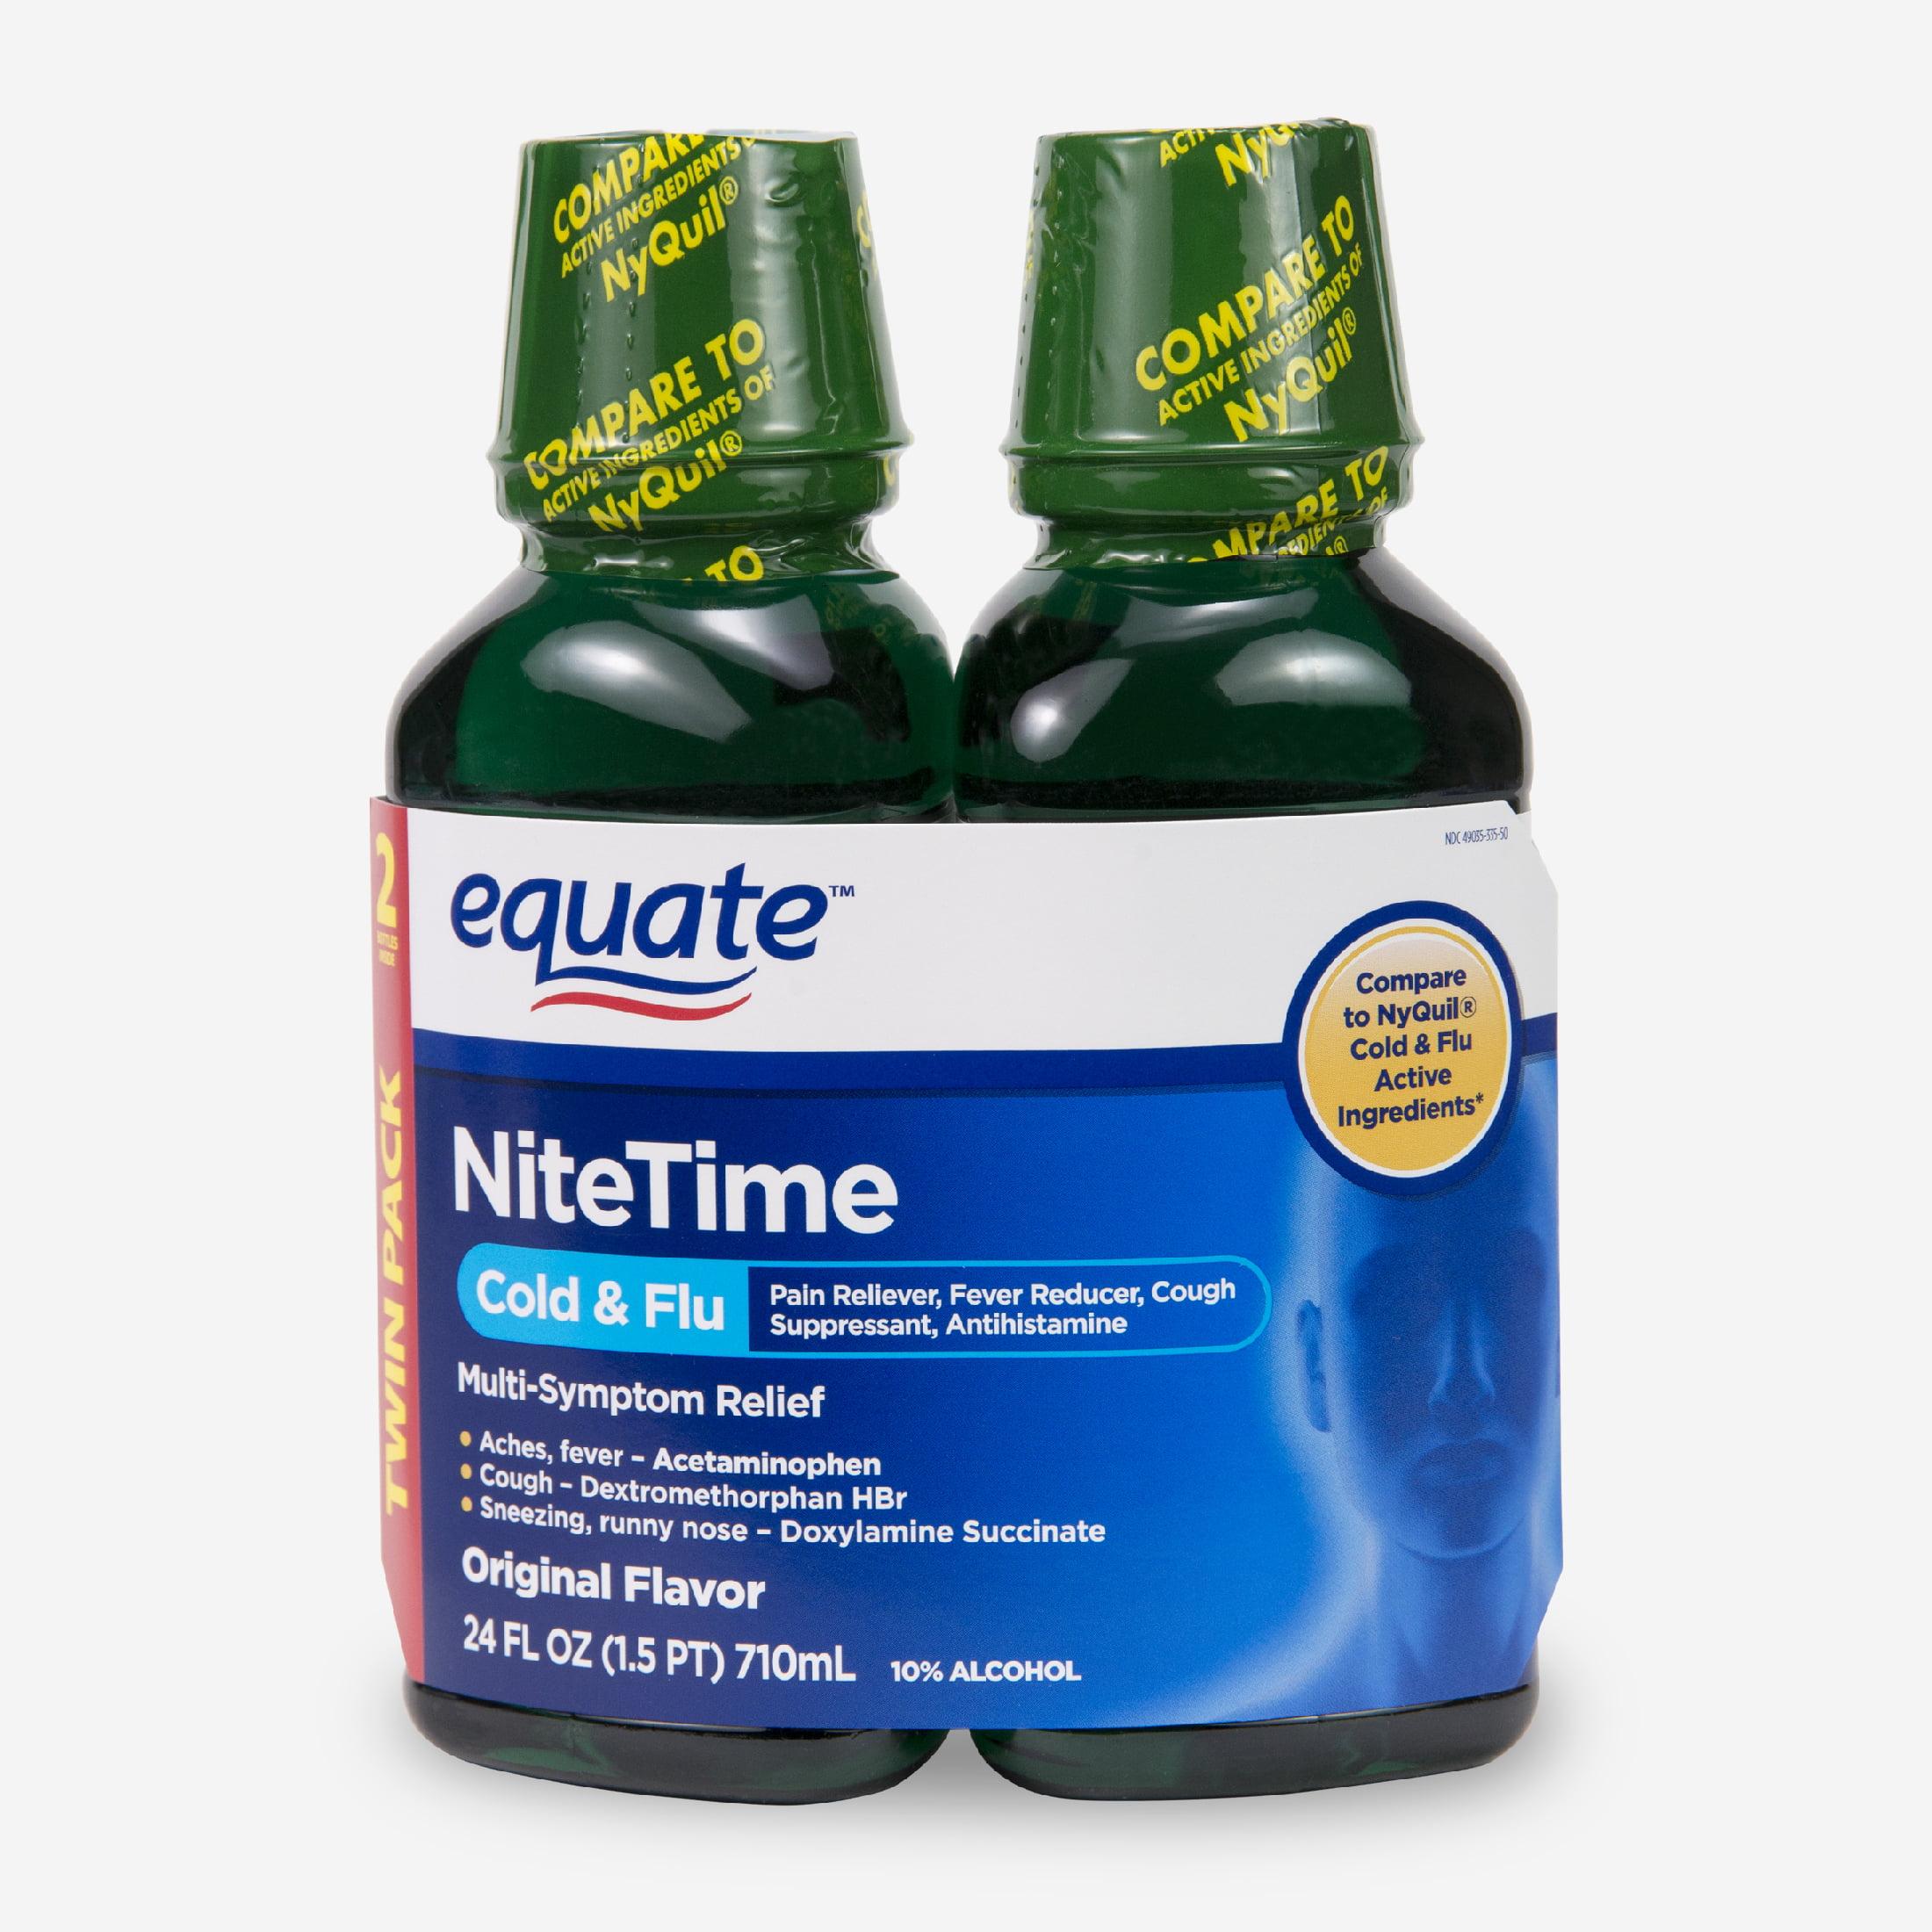 Equate Nitetime Original Flavor Cold & Flu Relief, 12 fl oz, 2 ct